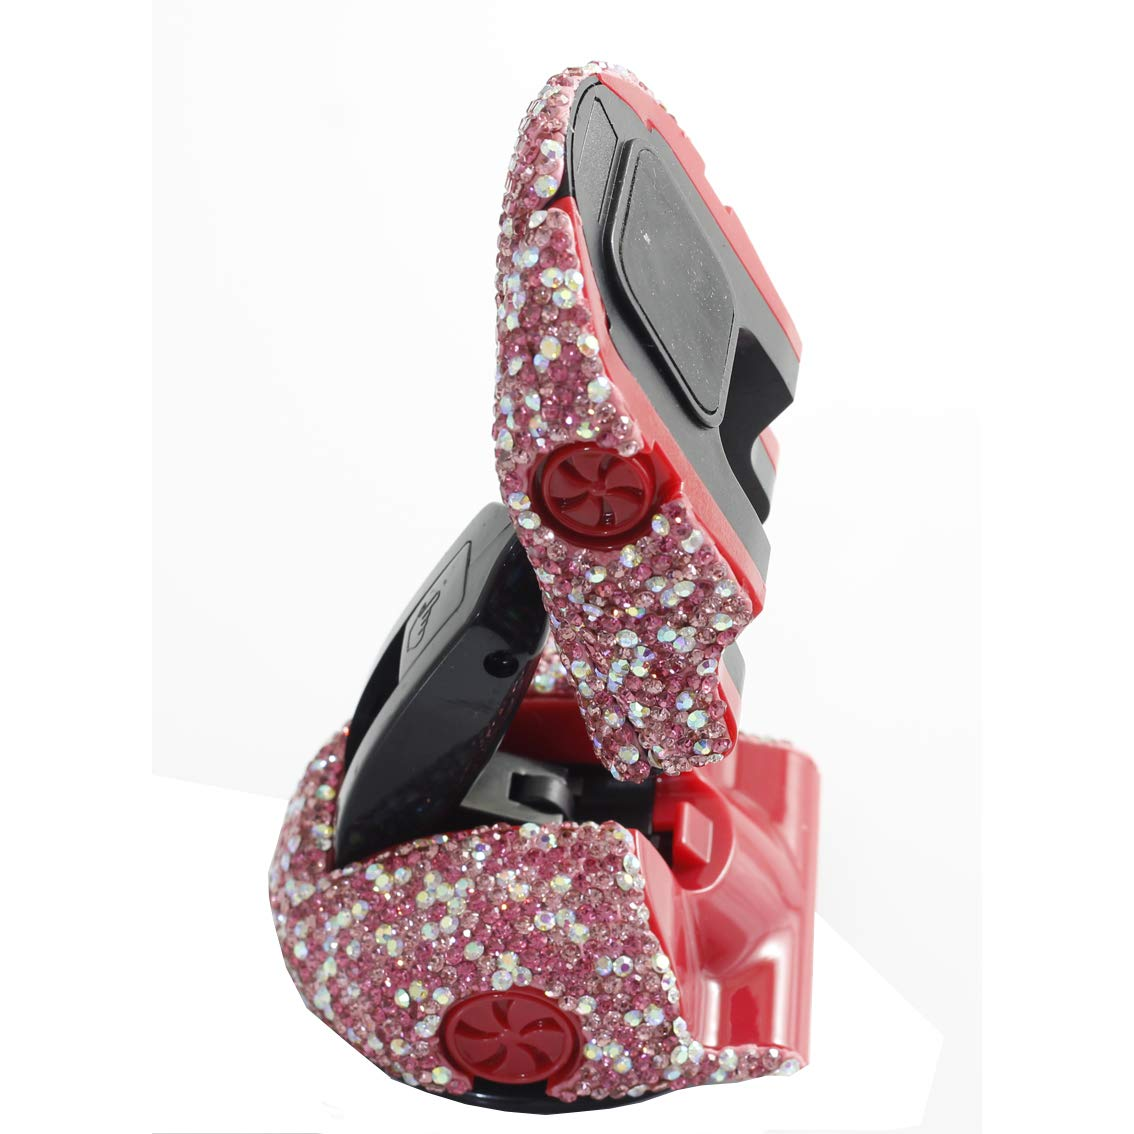 Bestbling Bling Rhinestone Sports Car Shaped Magnetic Car Phone Holder Stand Bracket Silver